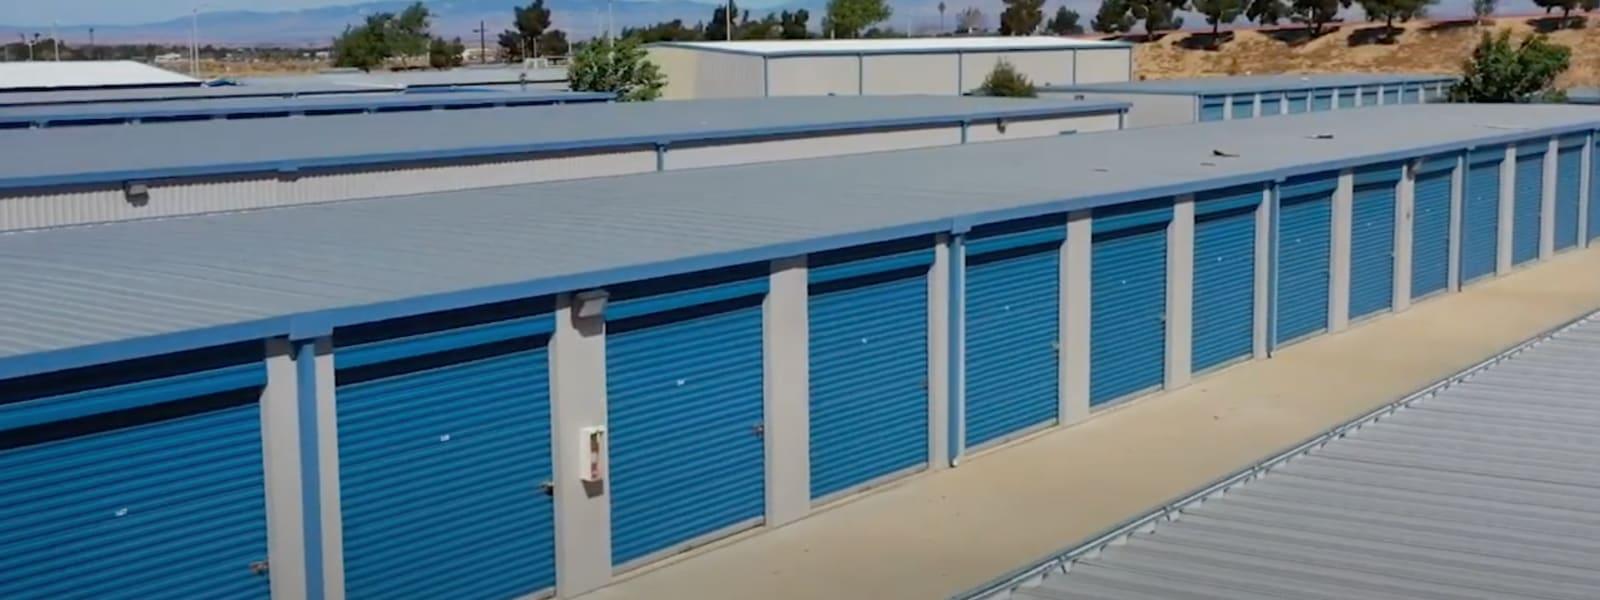 AAA Self Storage, LLC in Chatsworth, California